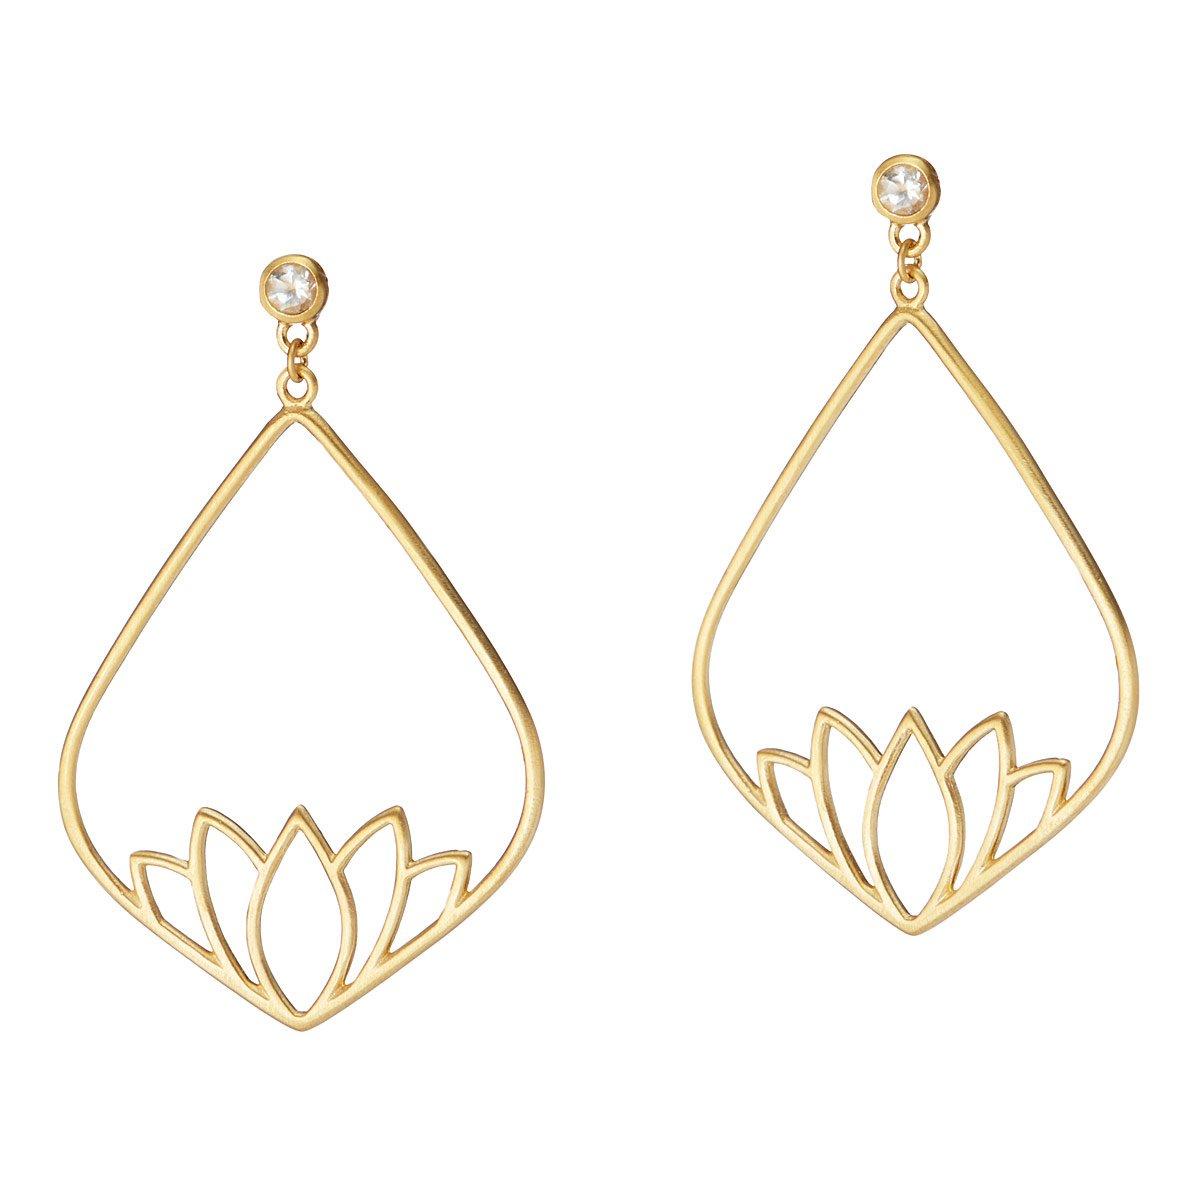 New Beginnings Lotus Earrings Inspirational Jewelry Uncommongoods